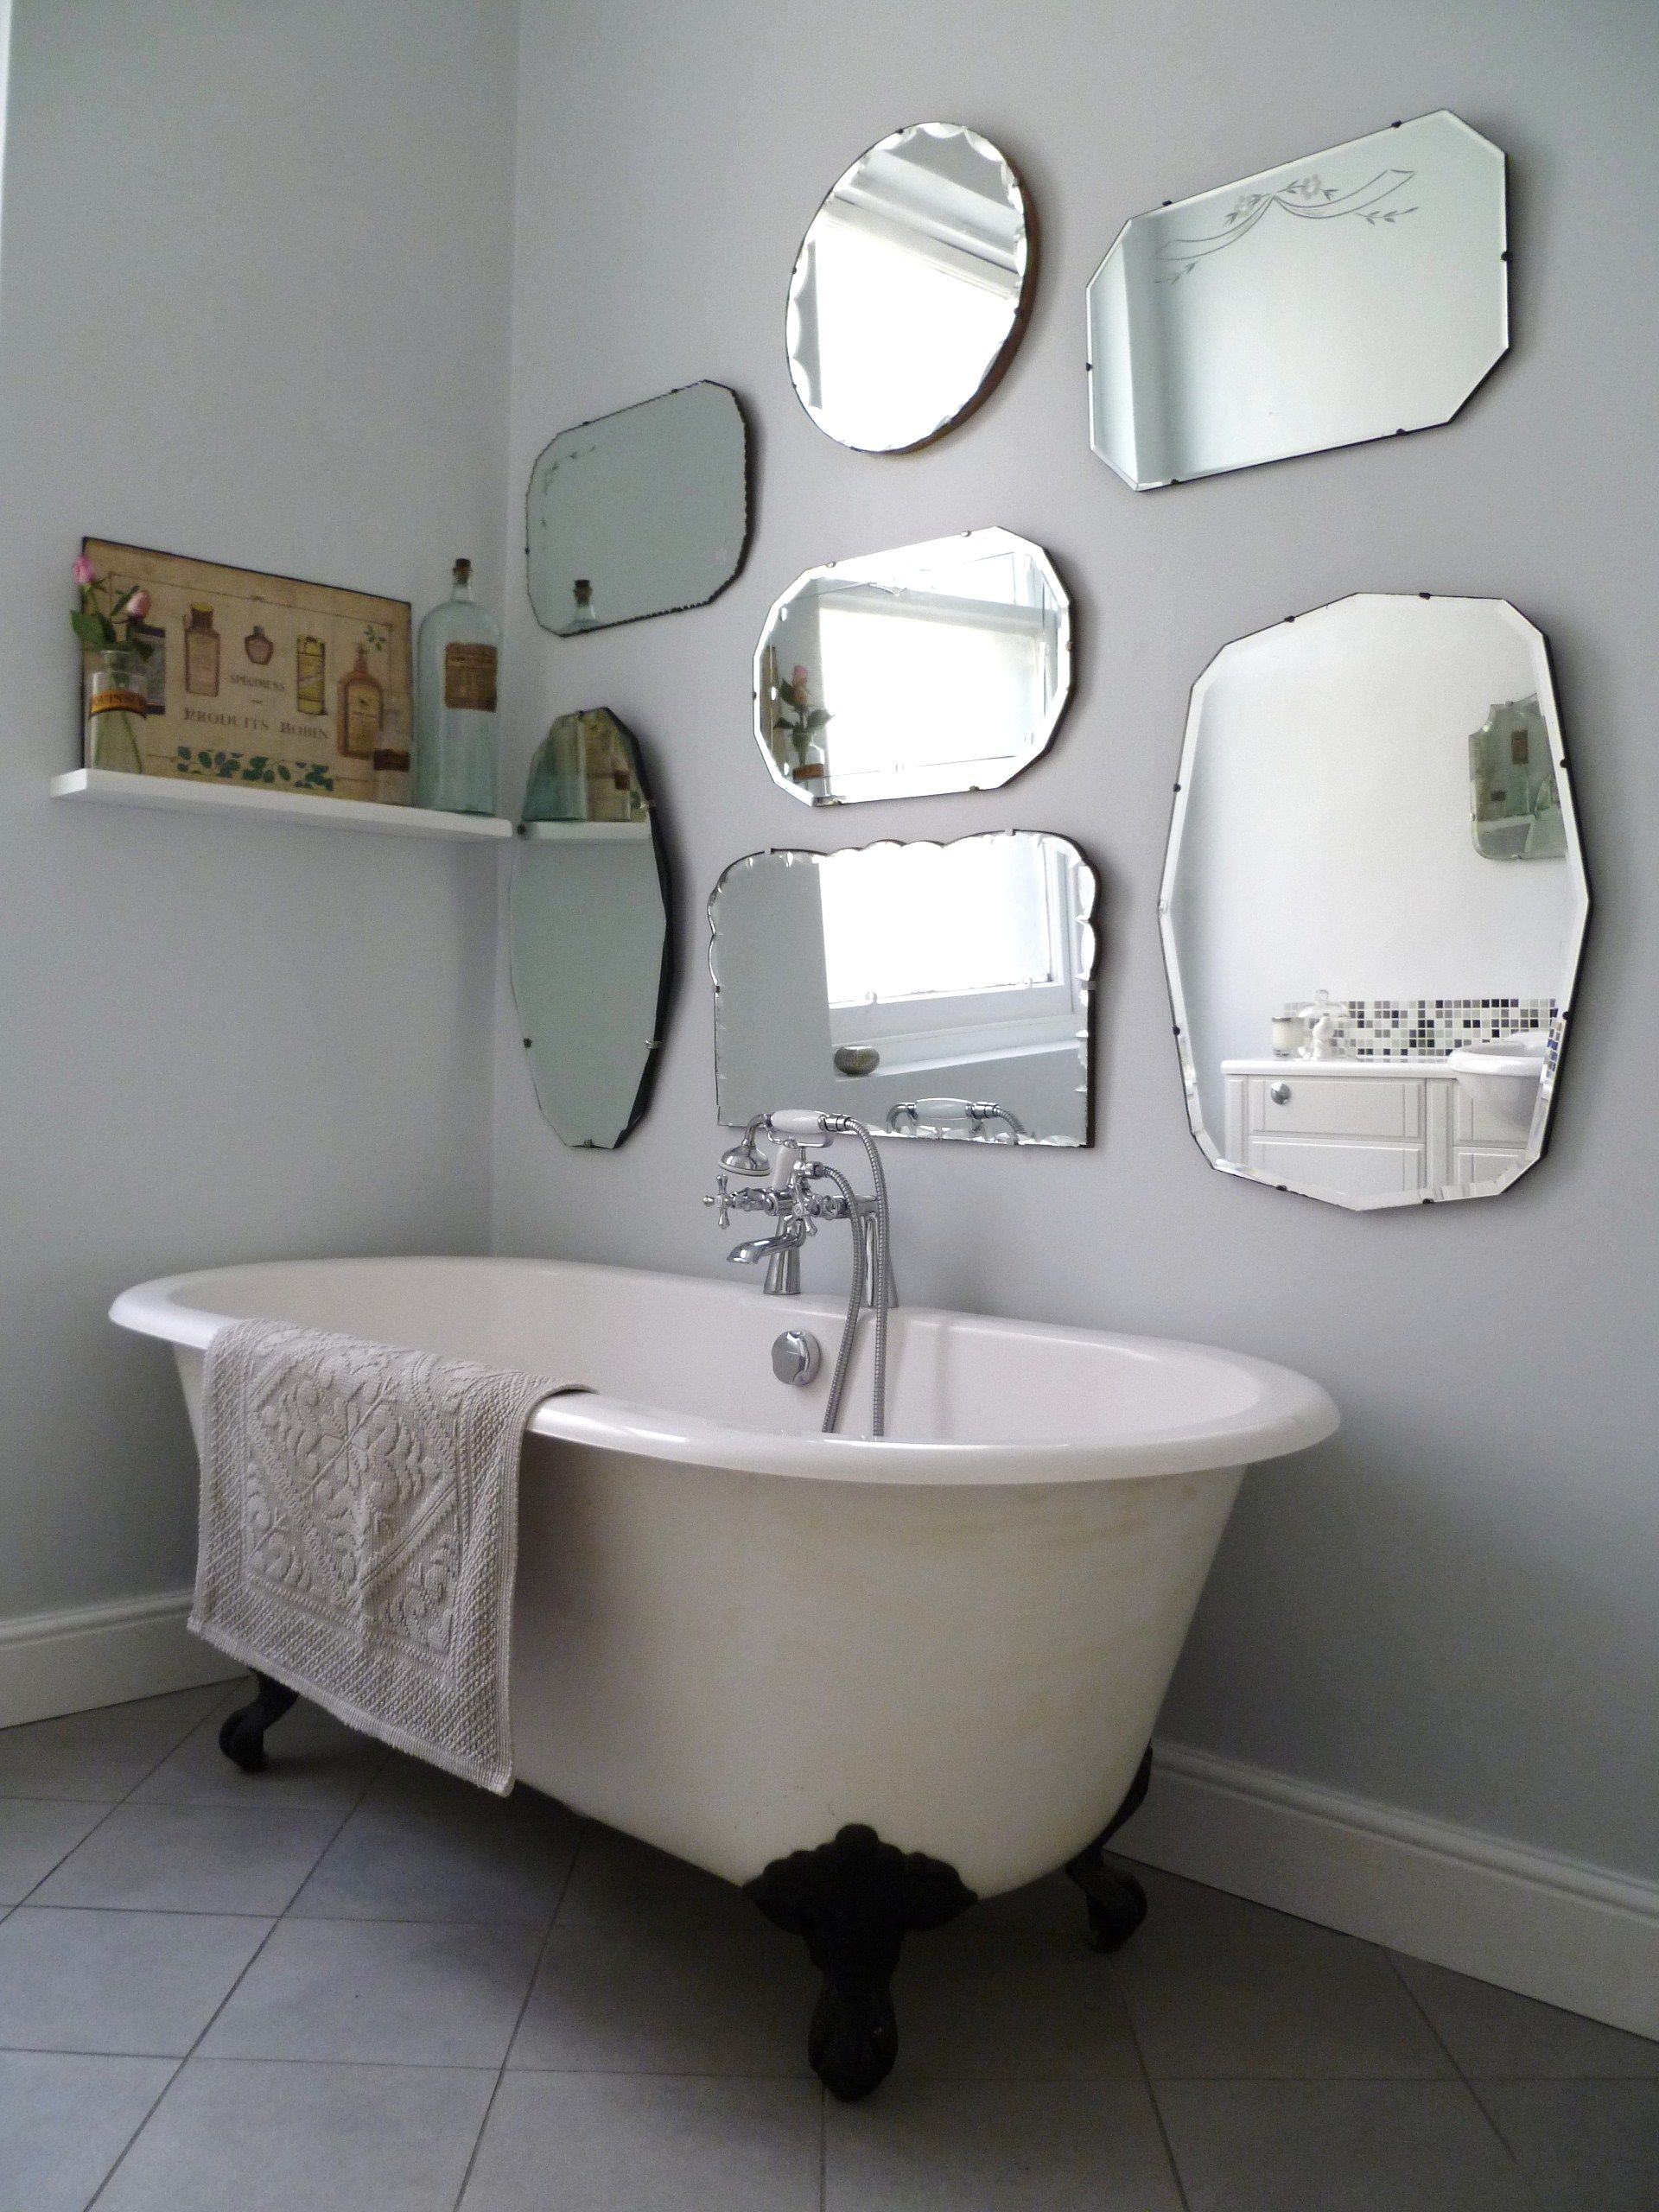 Vintage Bathroom Mirrors | Bathroom Mirror Ideas Diy For A Small Bathroom 3 Howse